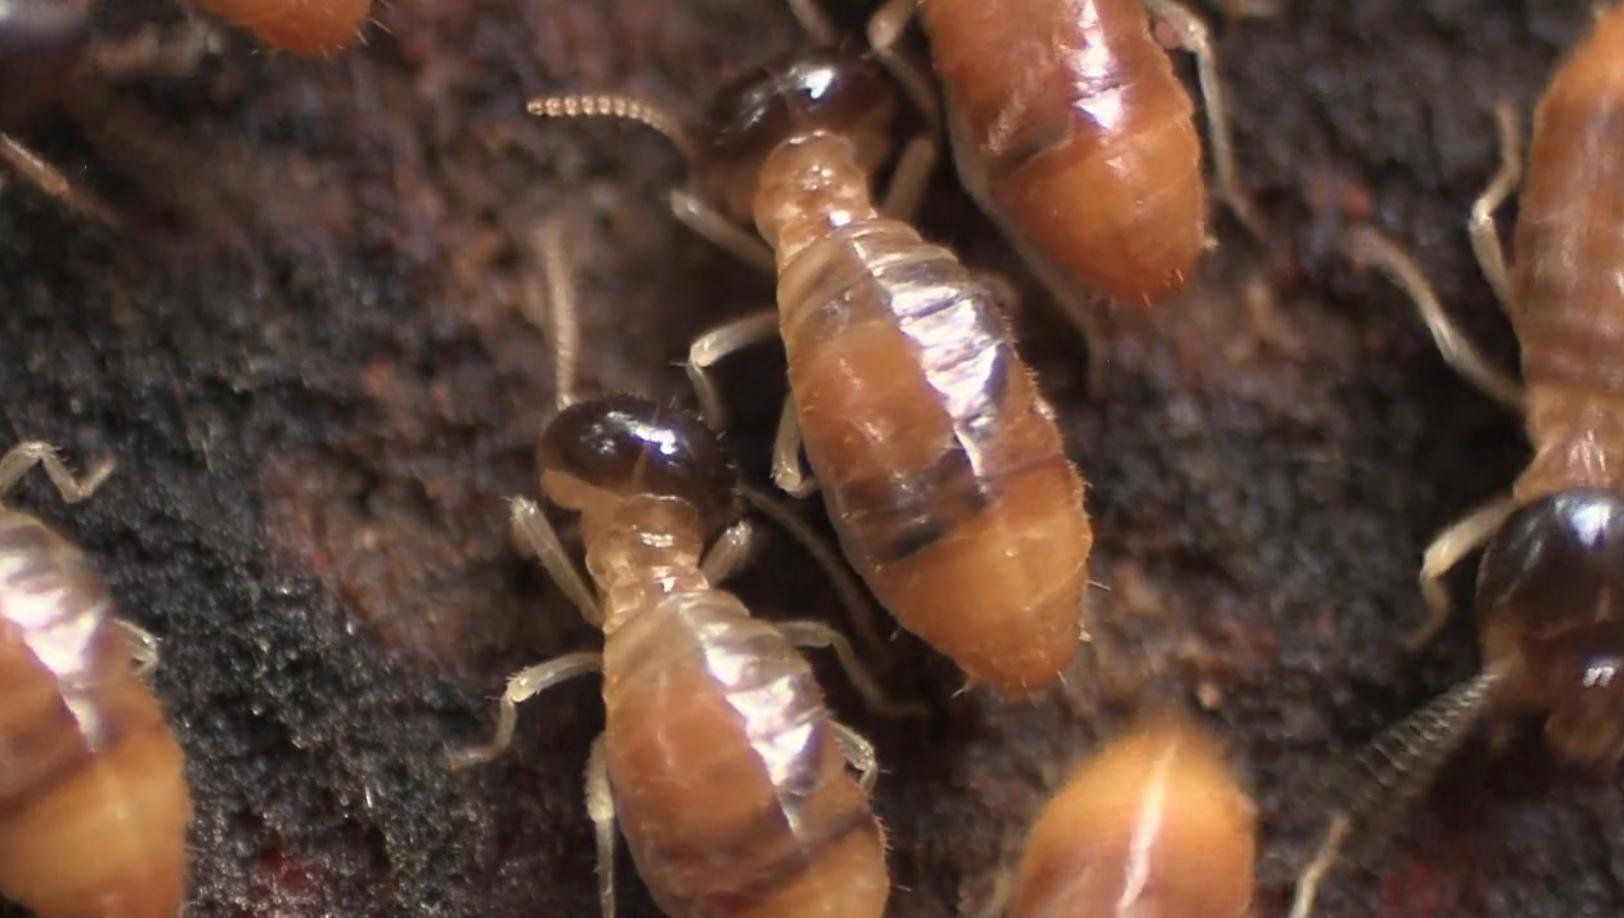 Termites feeding on the surface of a decaying log, Tipupitini Biodiversity Station, Ecuador